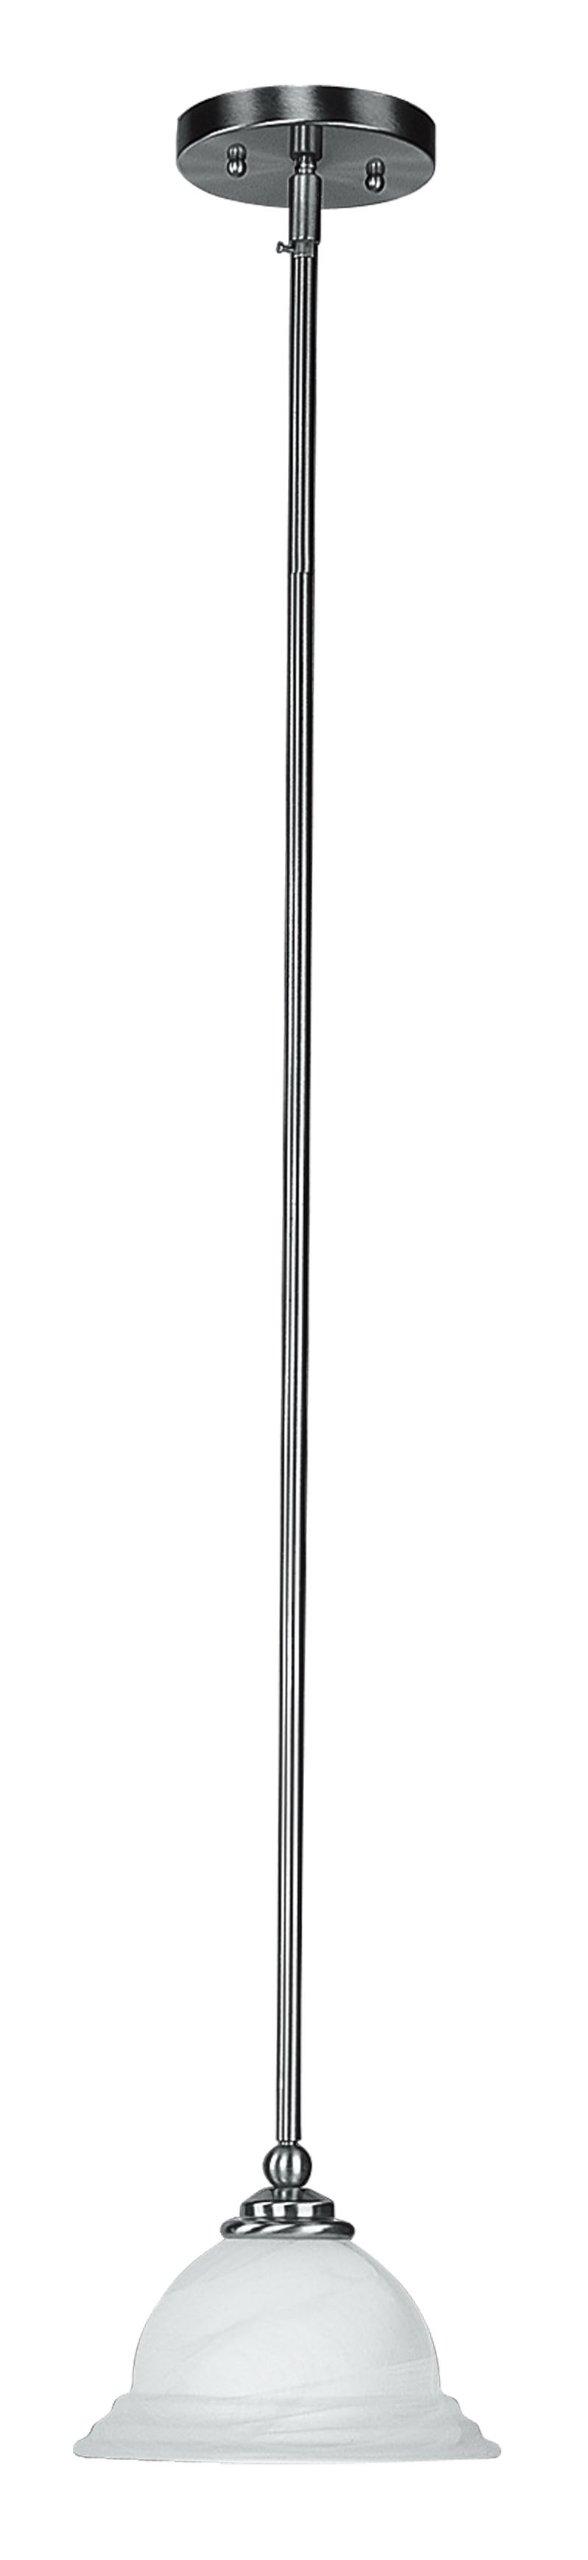 Livex Lighting 4256-91 North Port 1 Light Brushed Nickel Mini Pendant with White Alabaster Glass